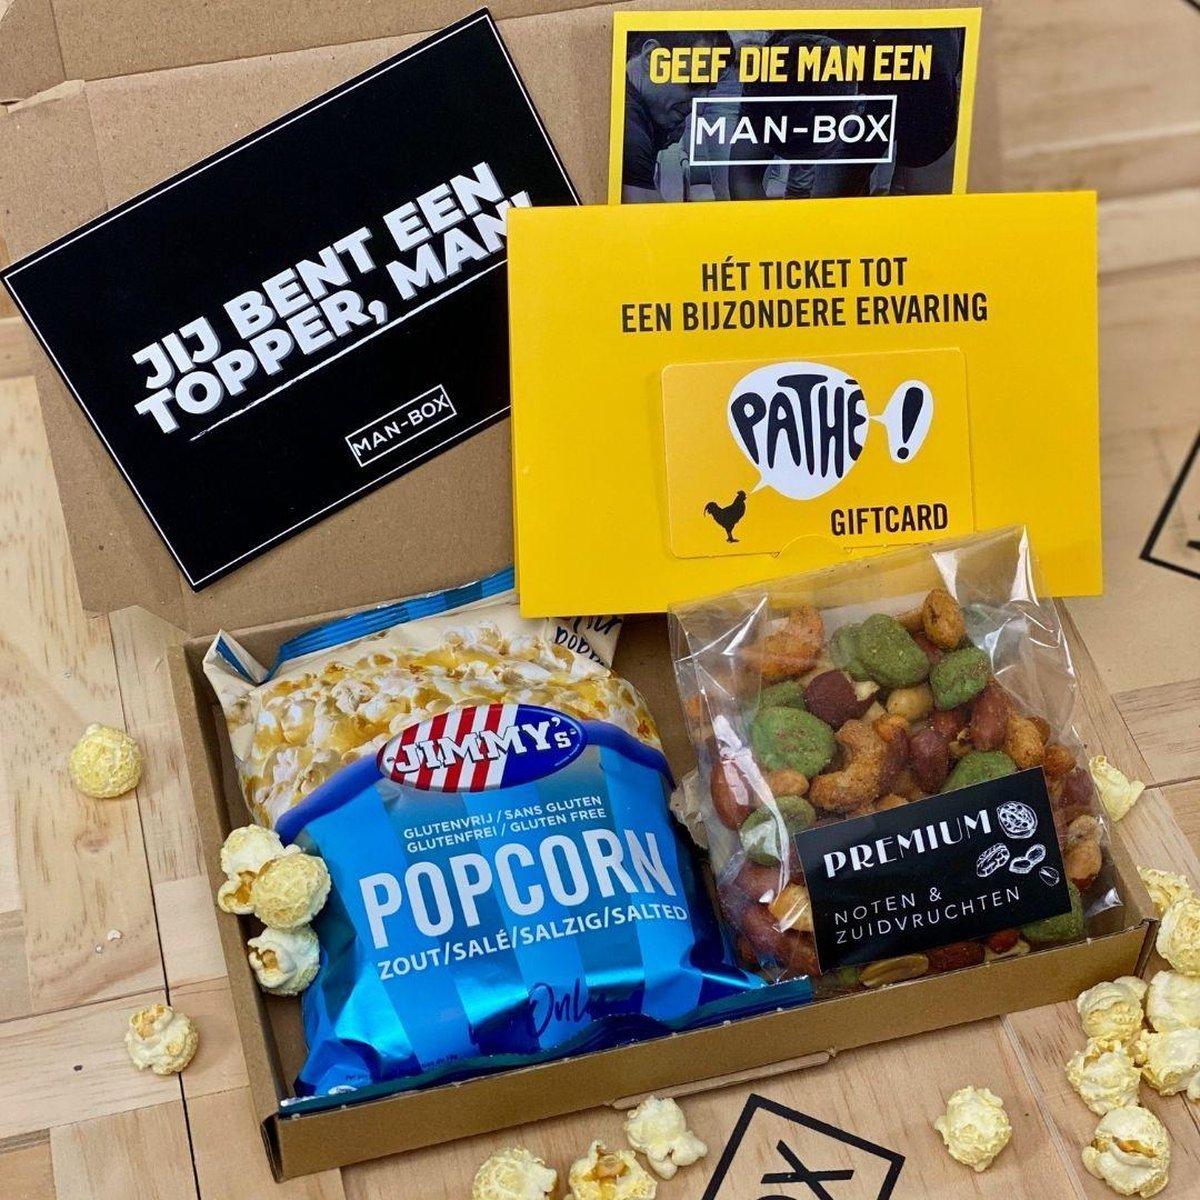 Man-Box Boxsy Film brievenbus cadeau